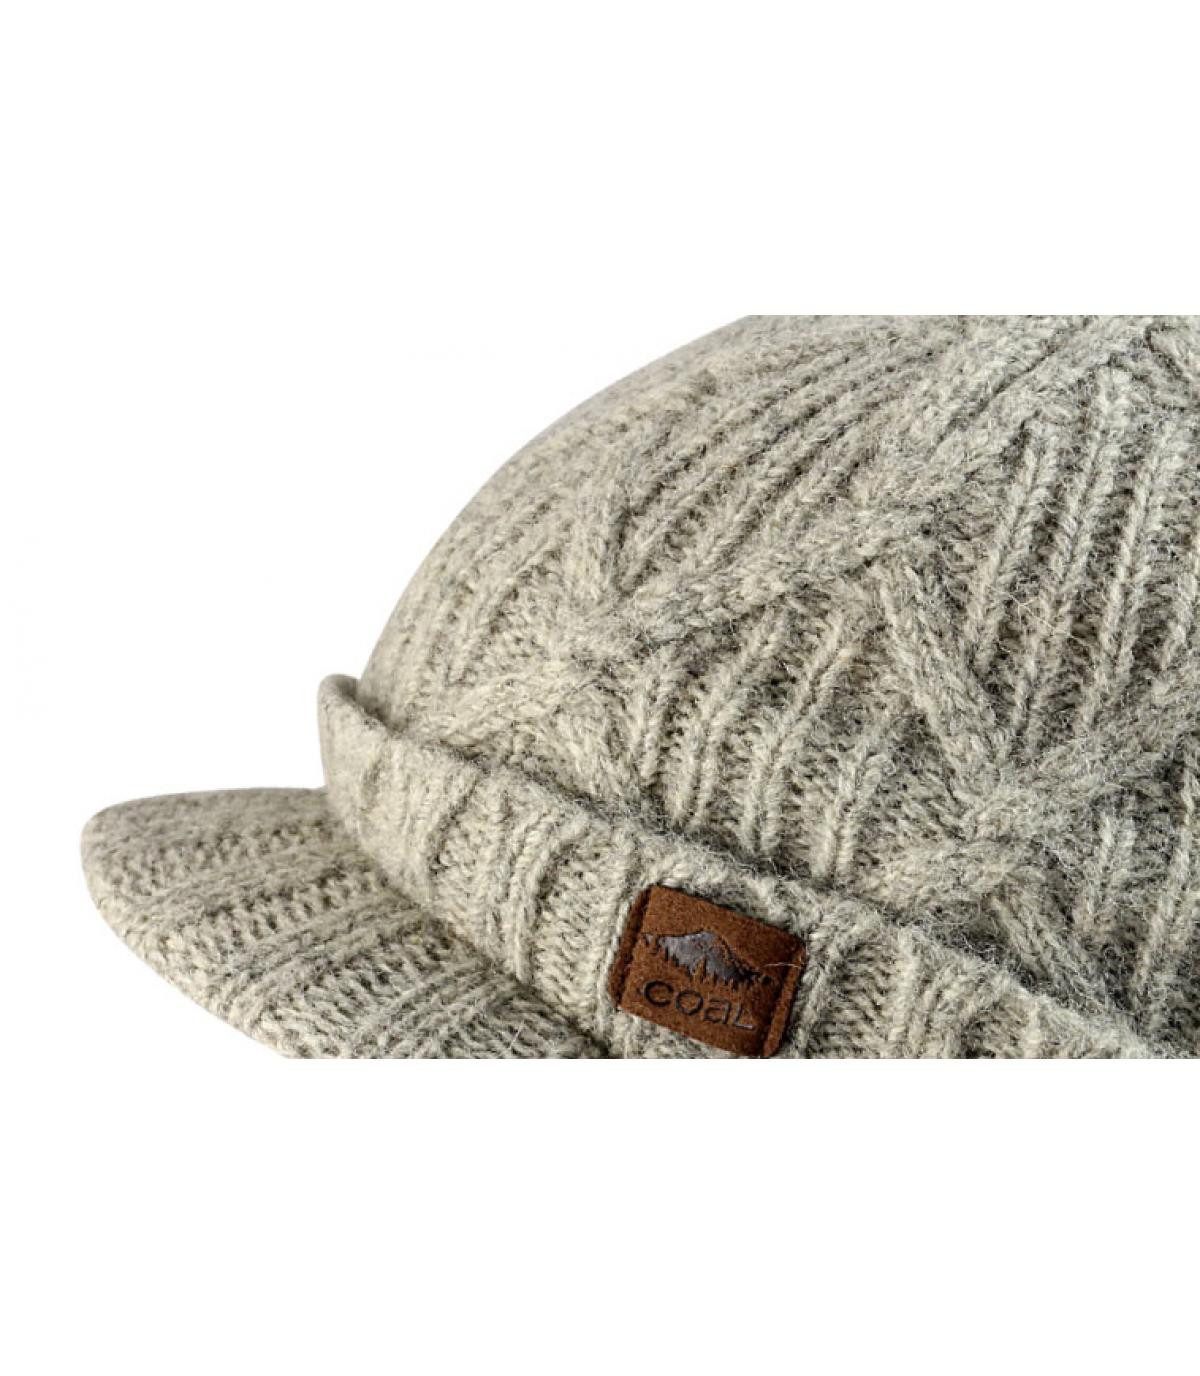 e52d3b72d57 Coal - Buy Coal beanies - Online headwear shop